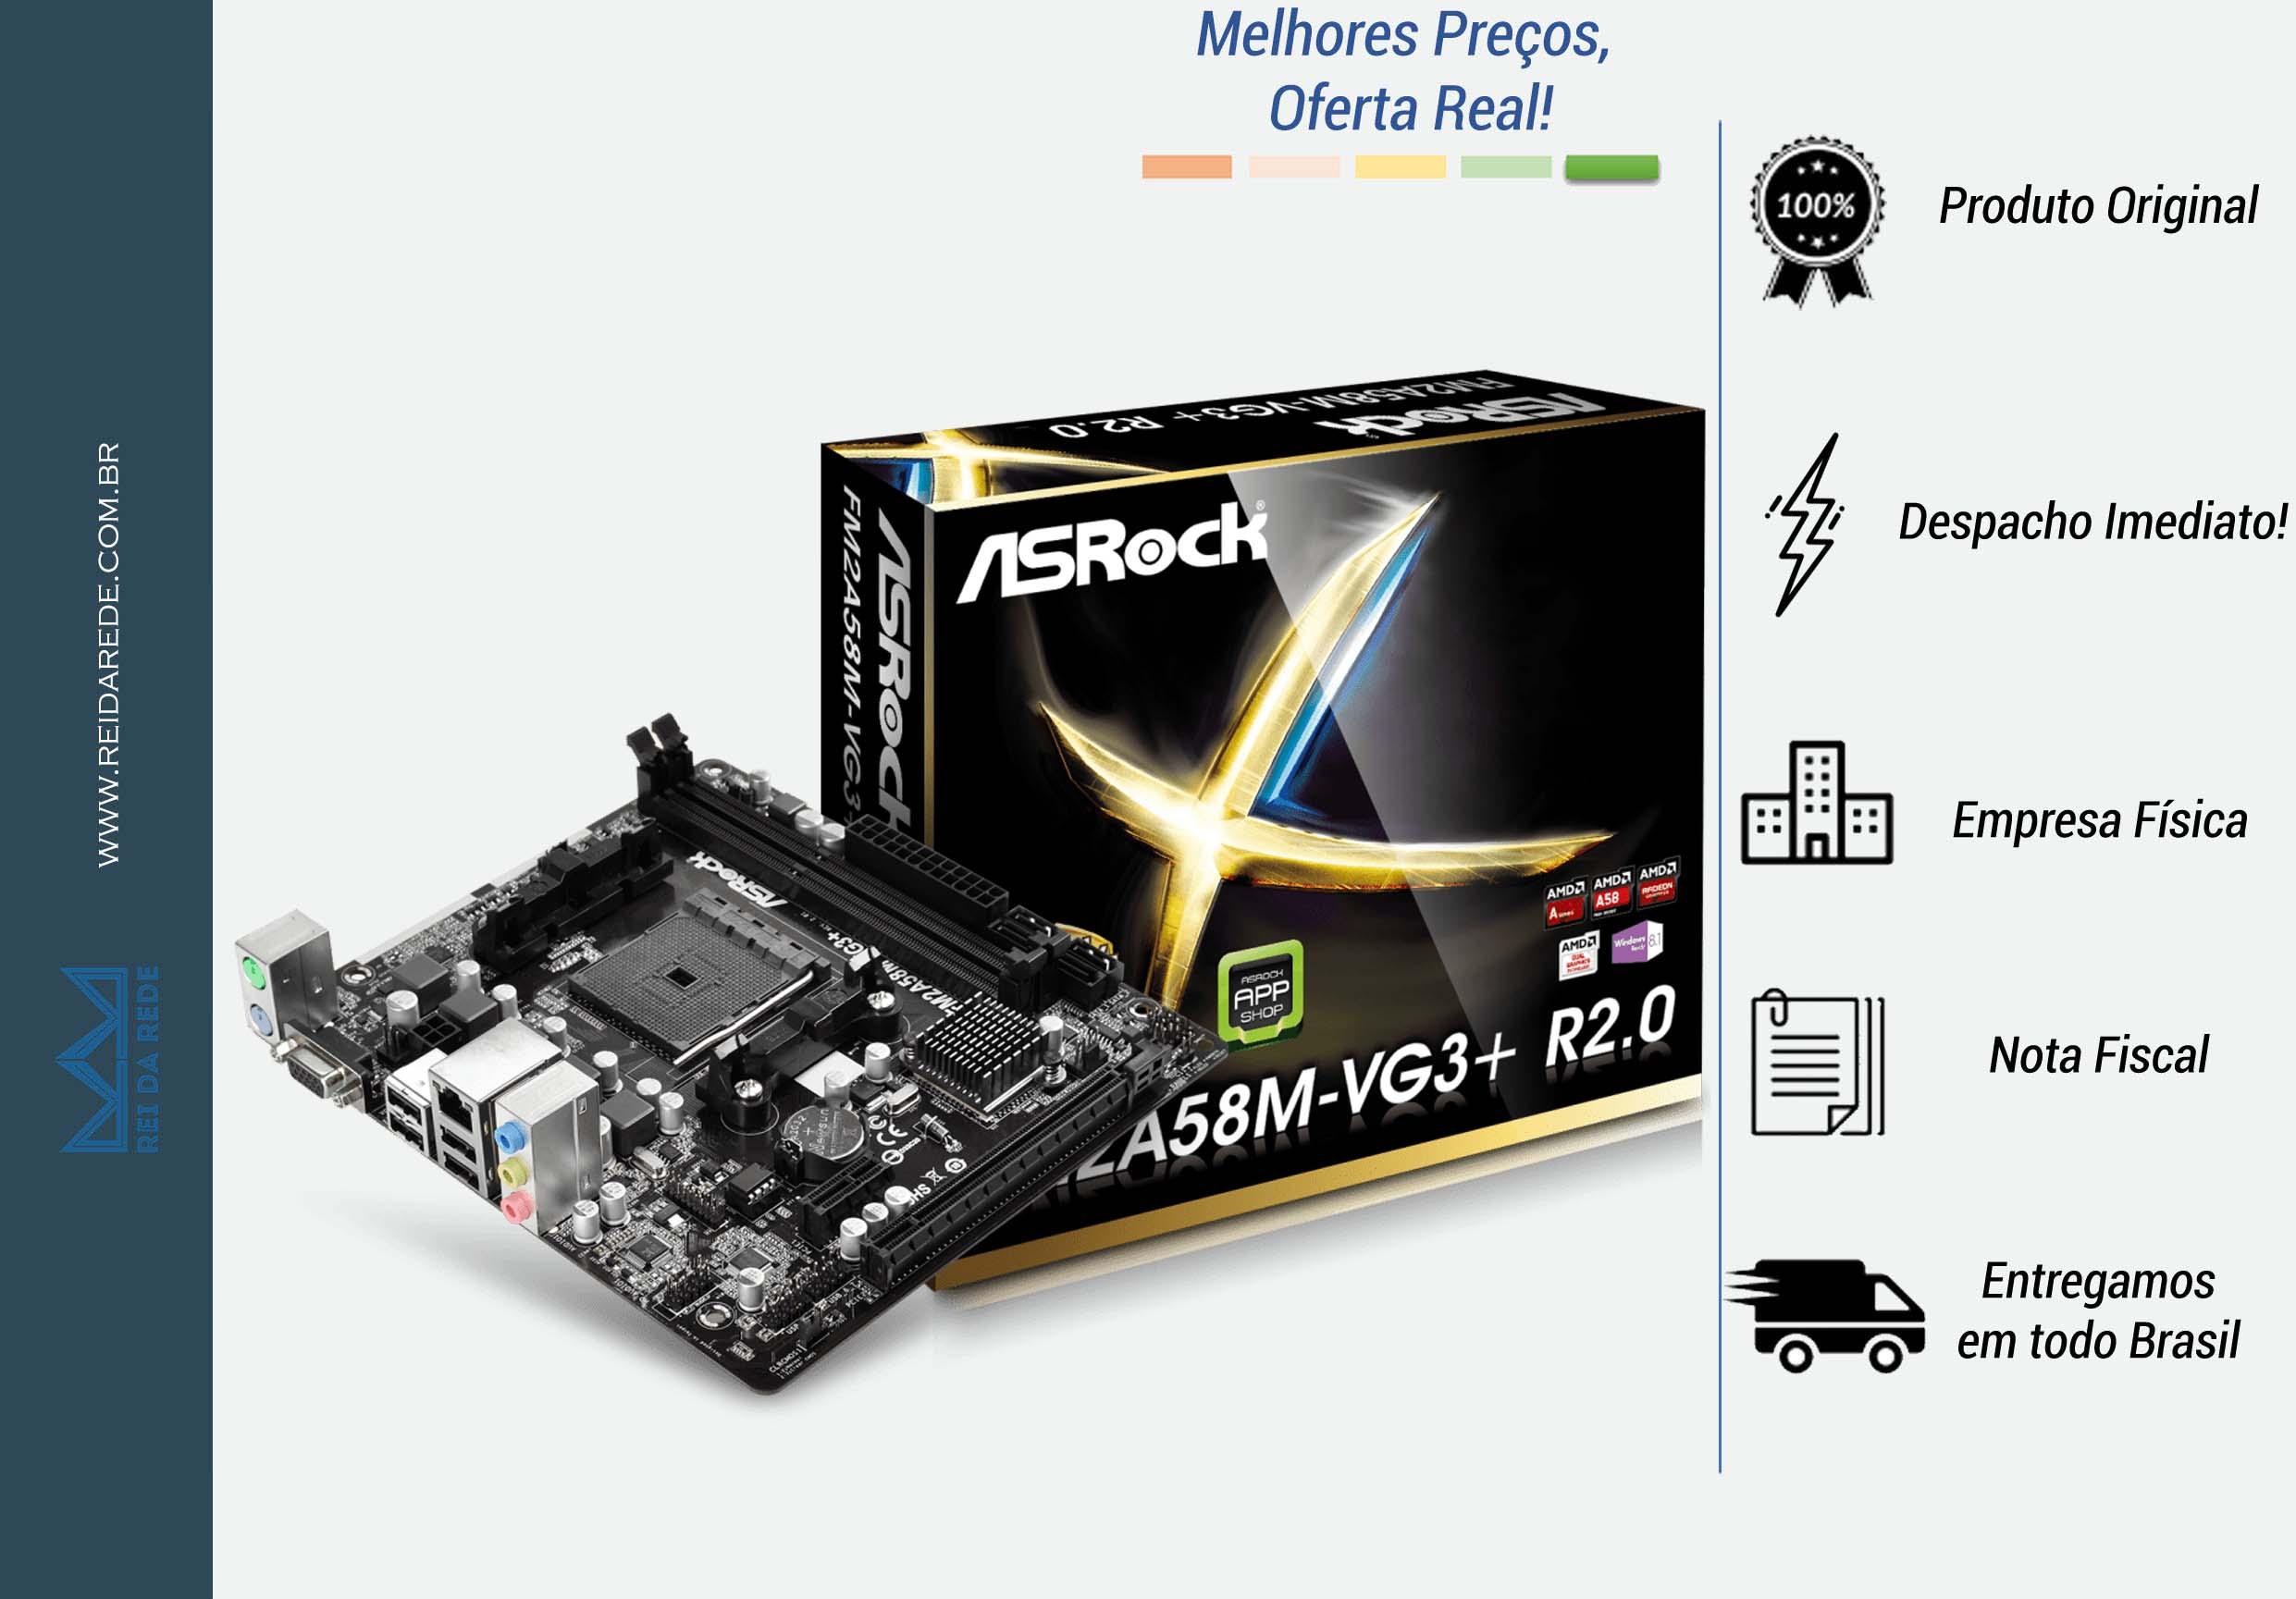 PLACA MAE ASROCK FM2 FM2A58M-VG3+ R2.0 BOX